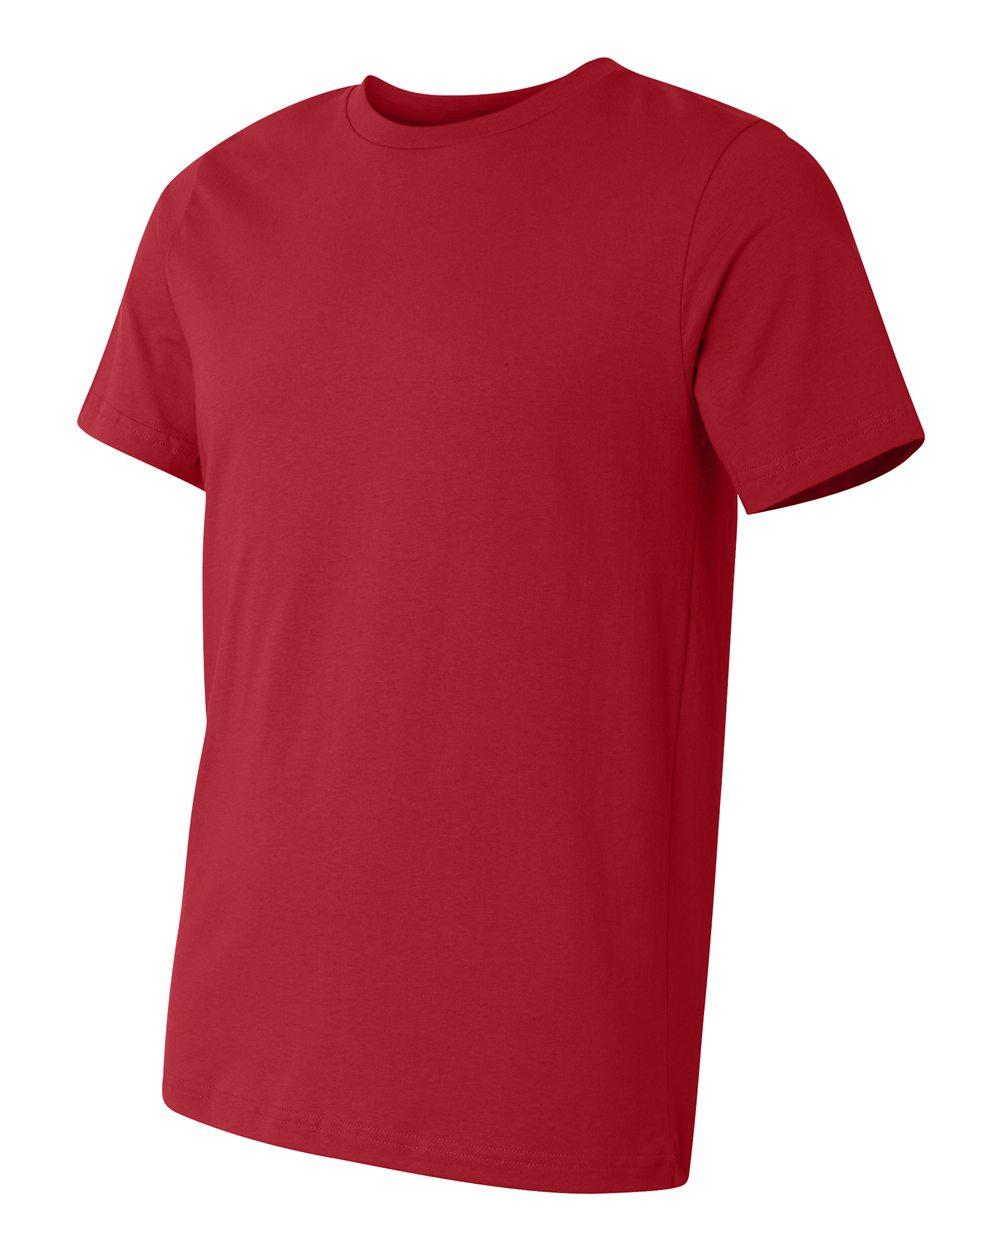 Bella-Canvas-Unisex-Made-in-USA-Jersey-Short-Sleeve-T-Shirt-3001U-XS-3XL thumbnail 21